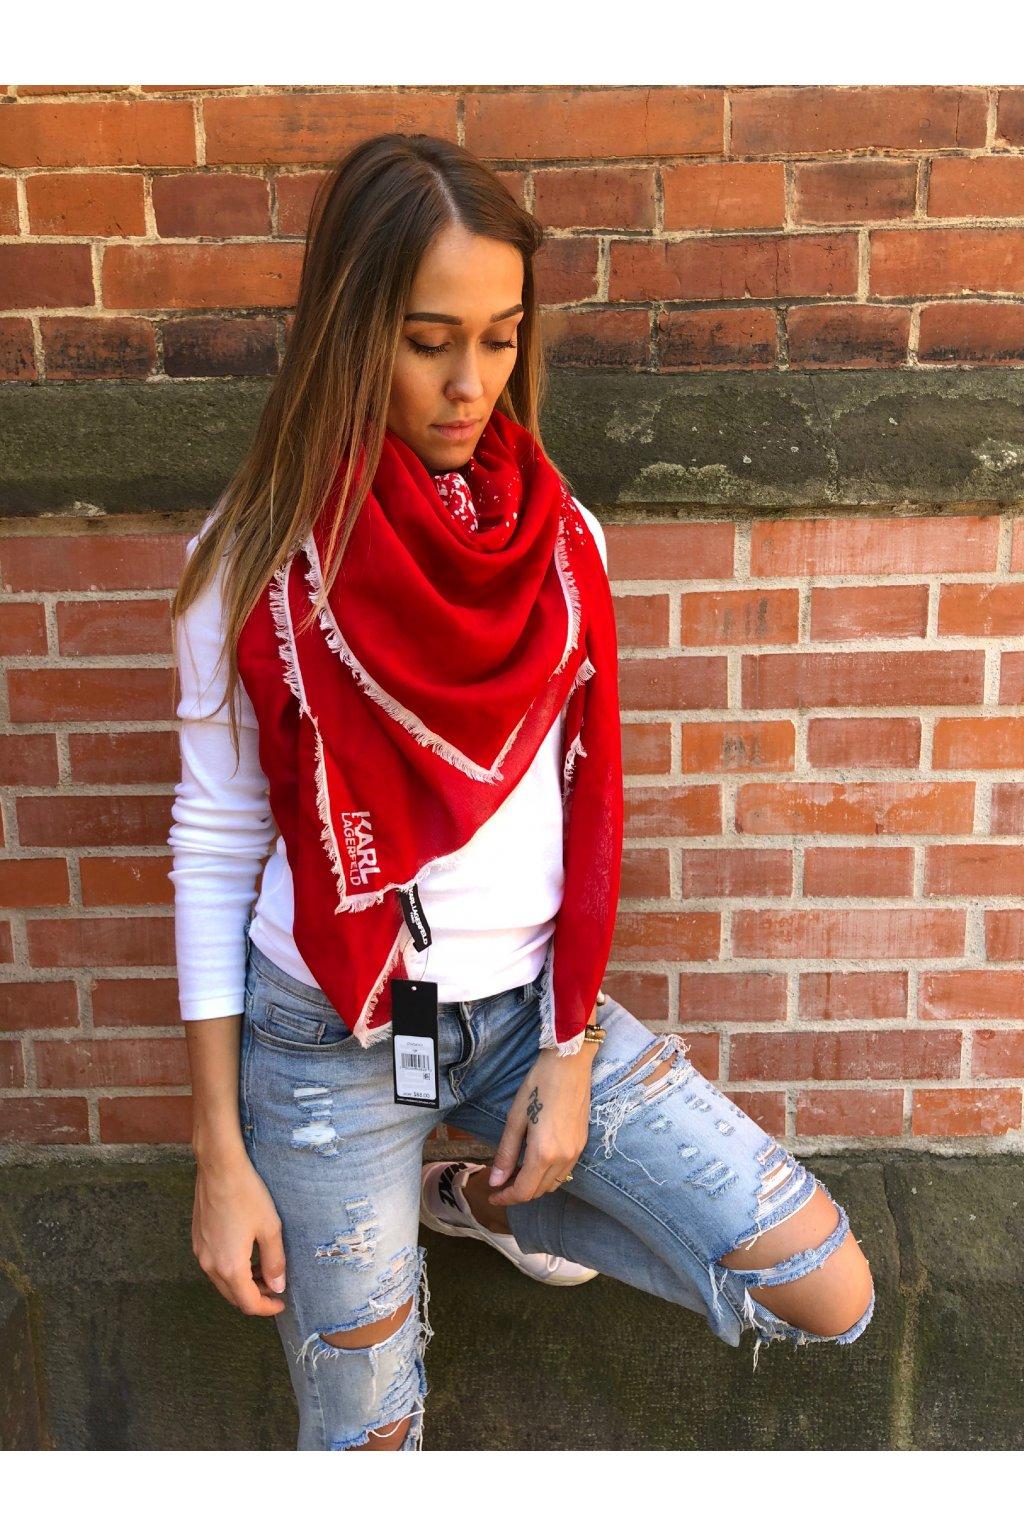 damsky satek karl lagerfeld abstract print fringed scarf rouge eshopat cz 1